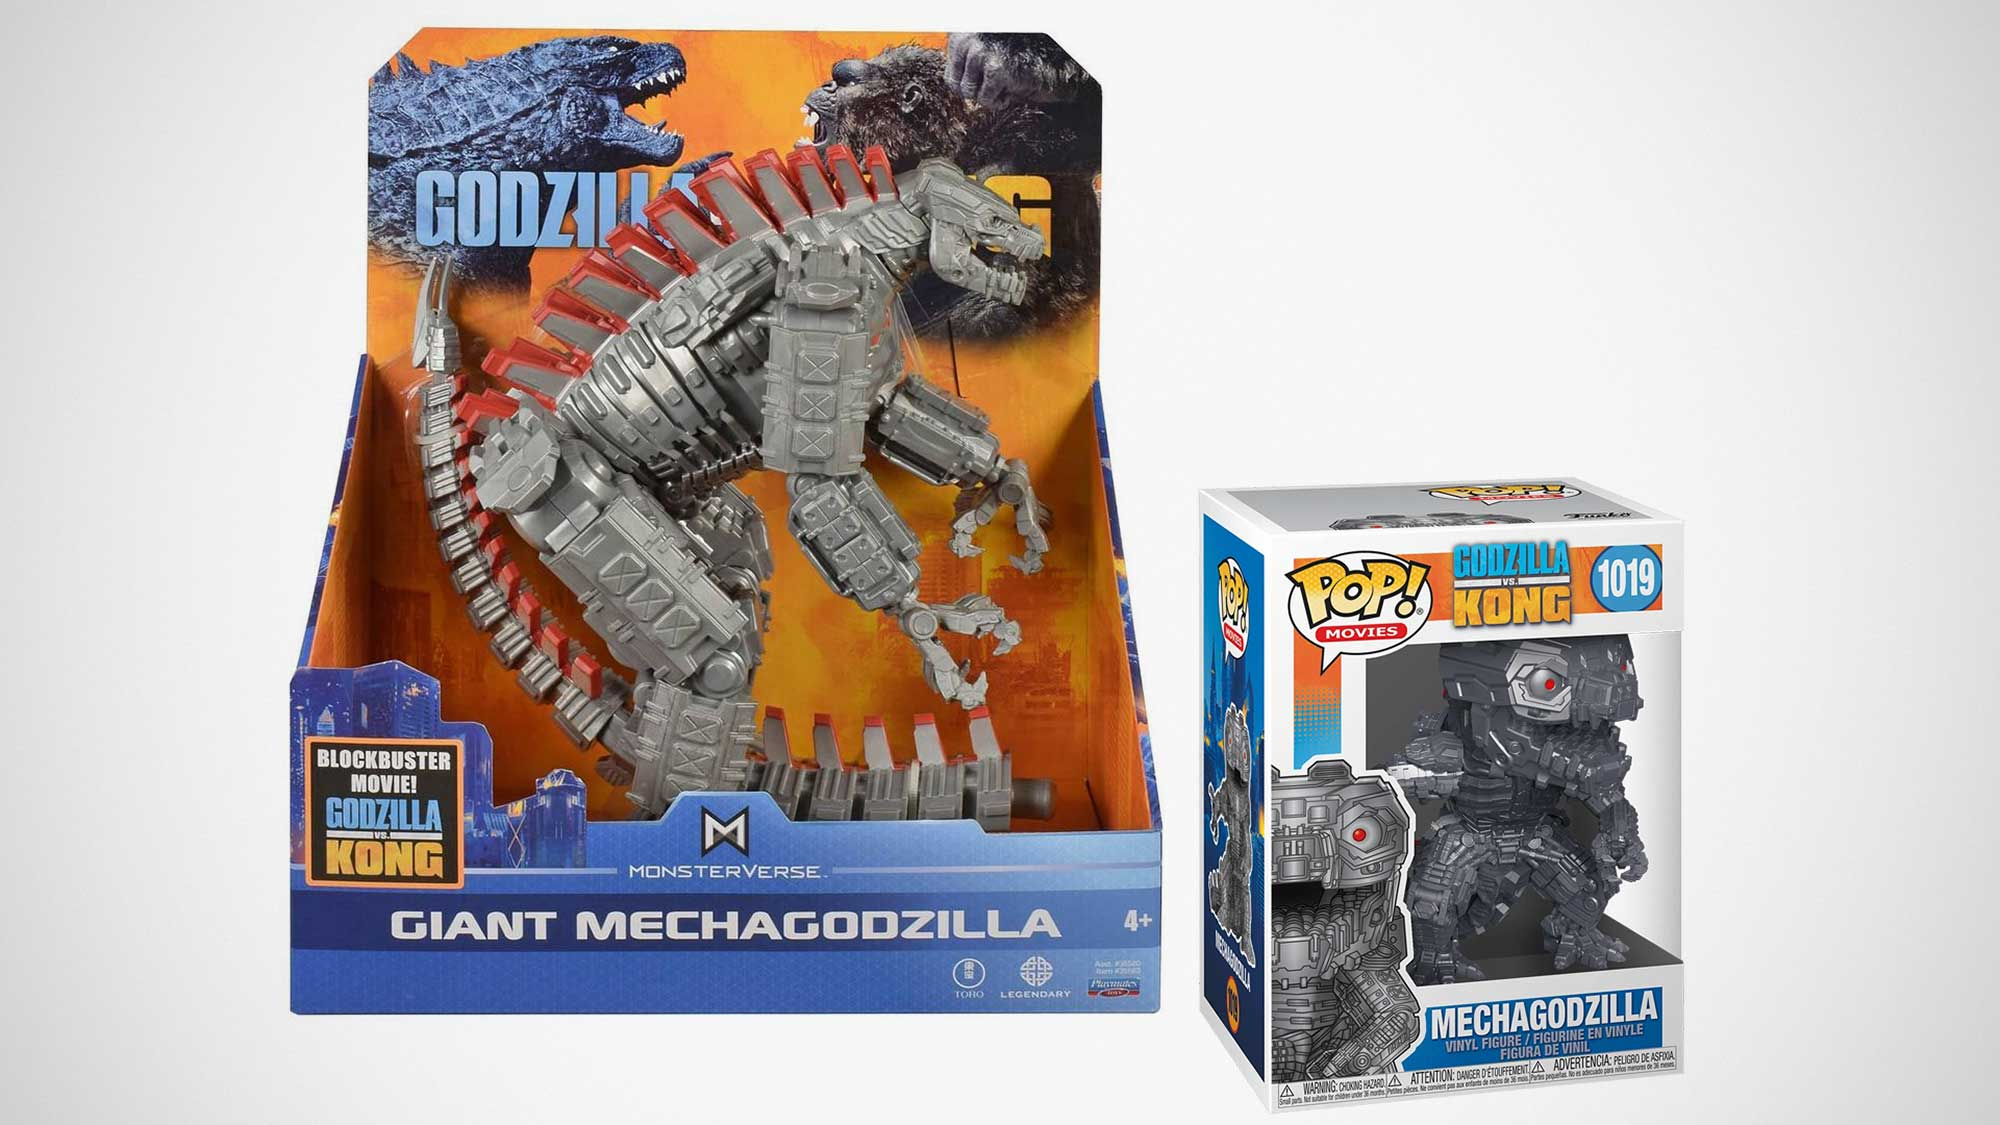 Funko and Playmates Mechagodzilla Toys